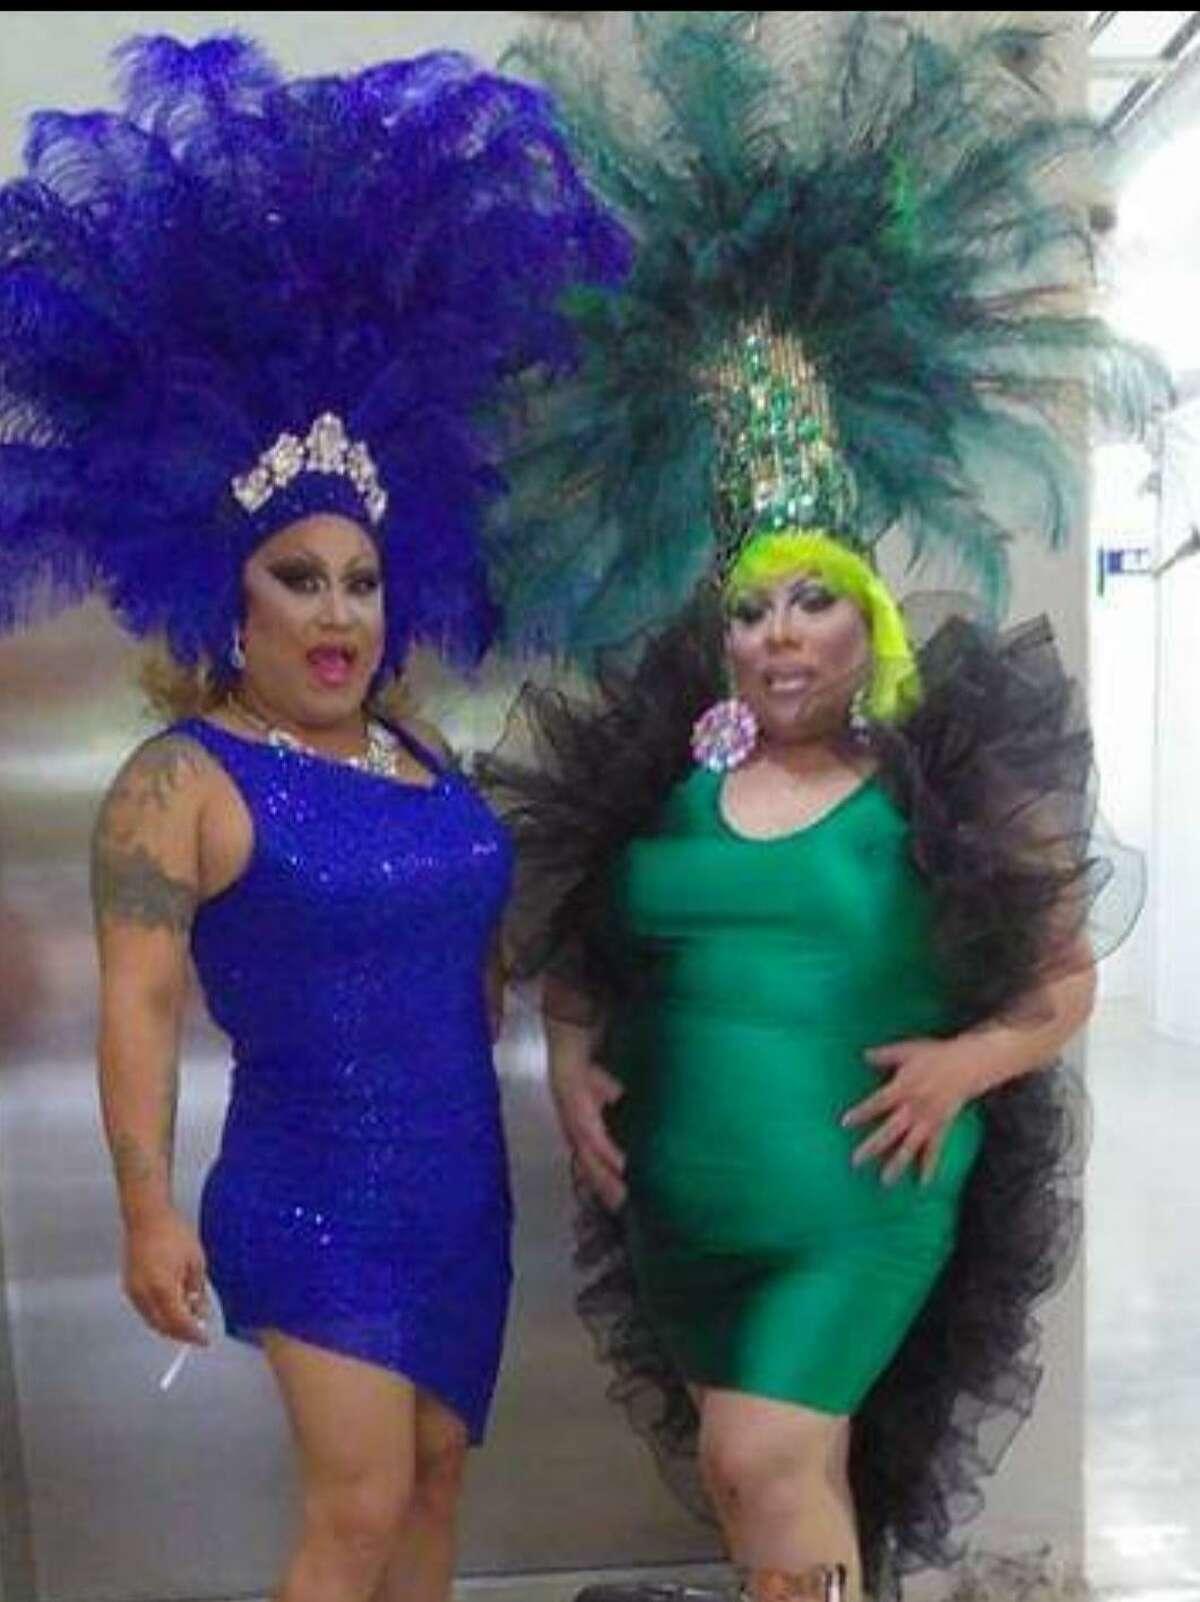 Dressmaker Maria Chavez, who sews ensembles for a lot of San Antonio drag artists, will receive the Vela Award from Pride San Antonio.